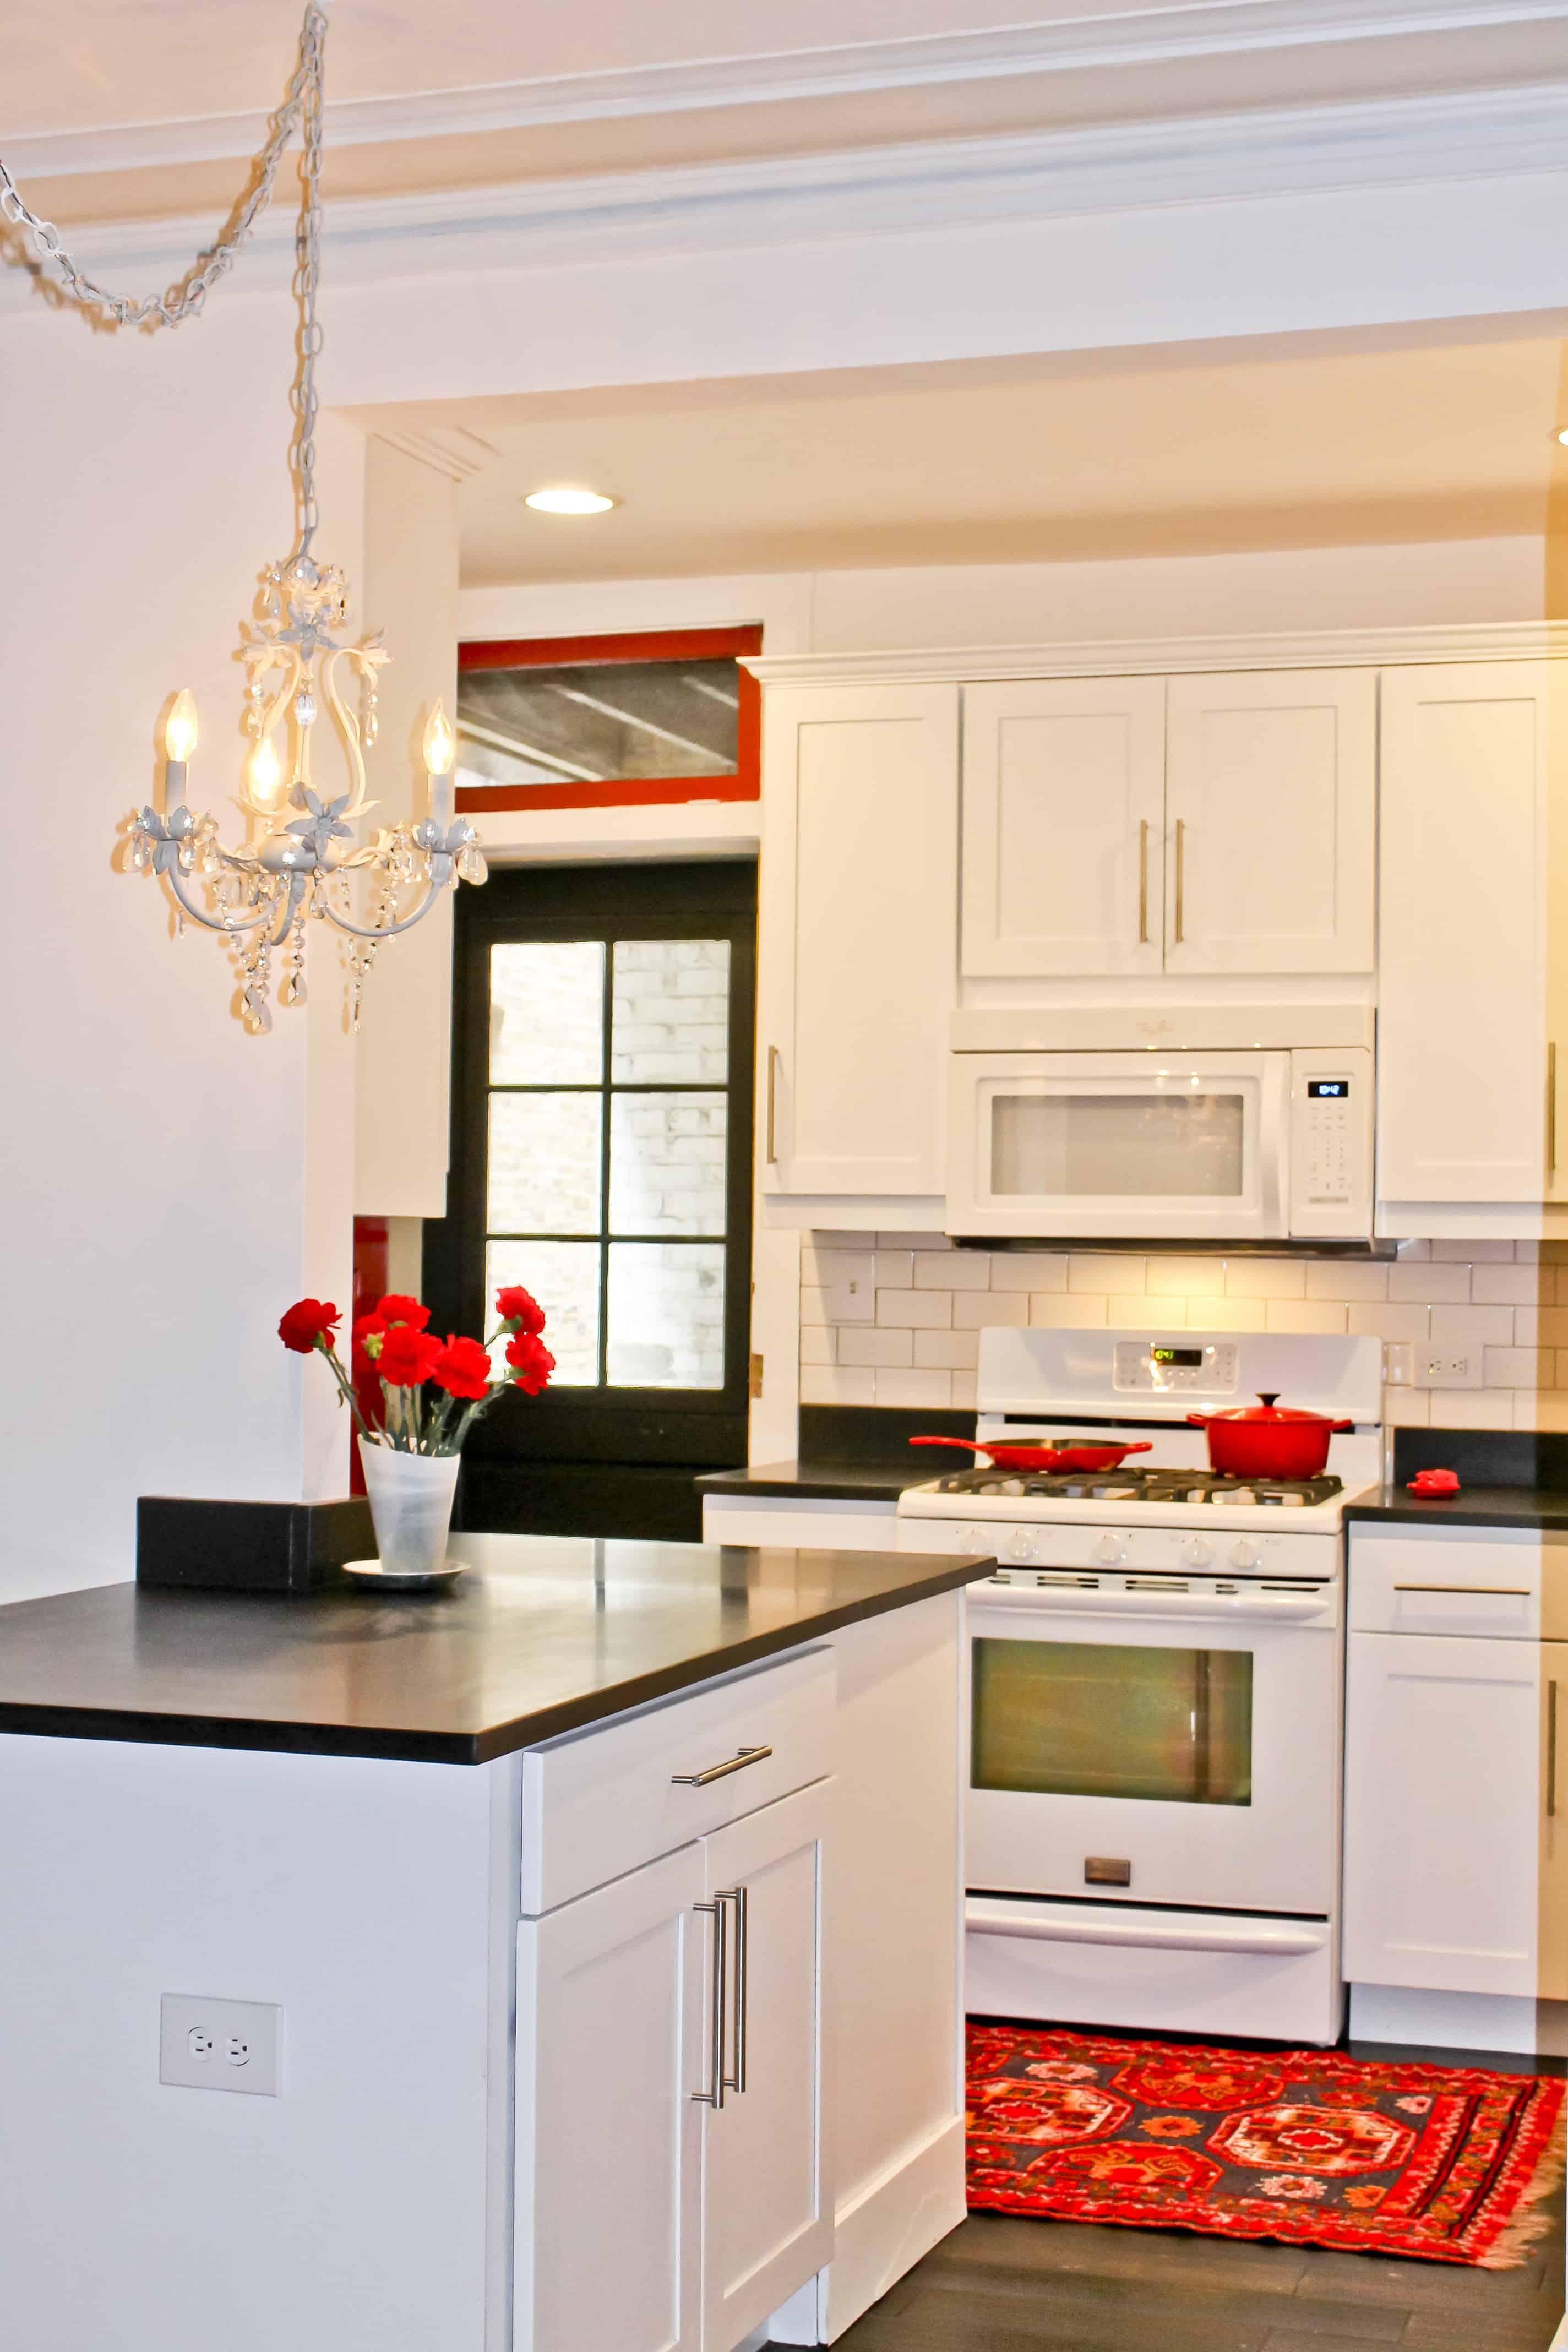 Kitchen Remodel – 819 Forest Ave, Evanston, IL – 123 Remodeling